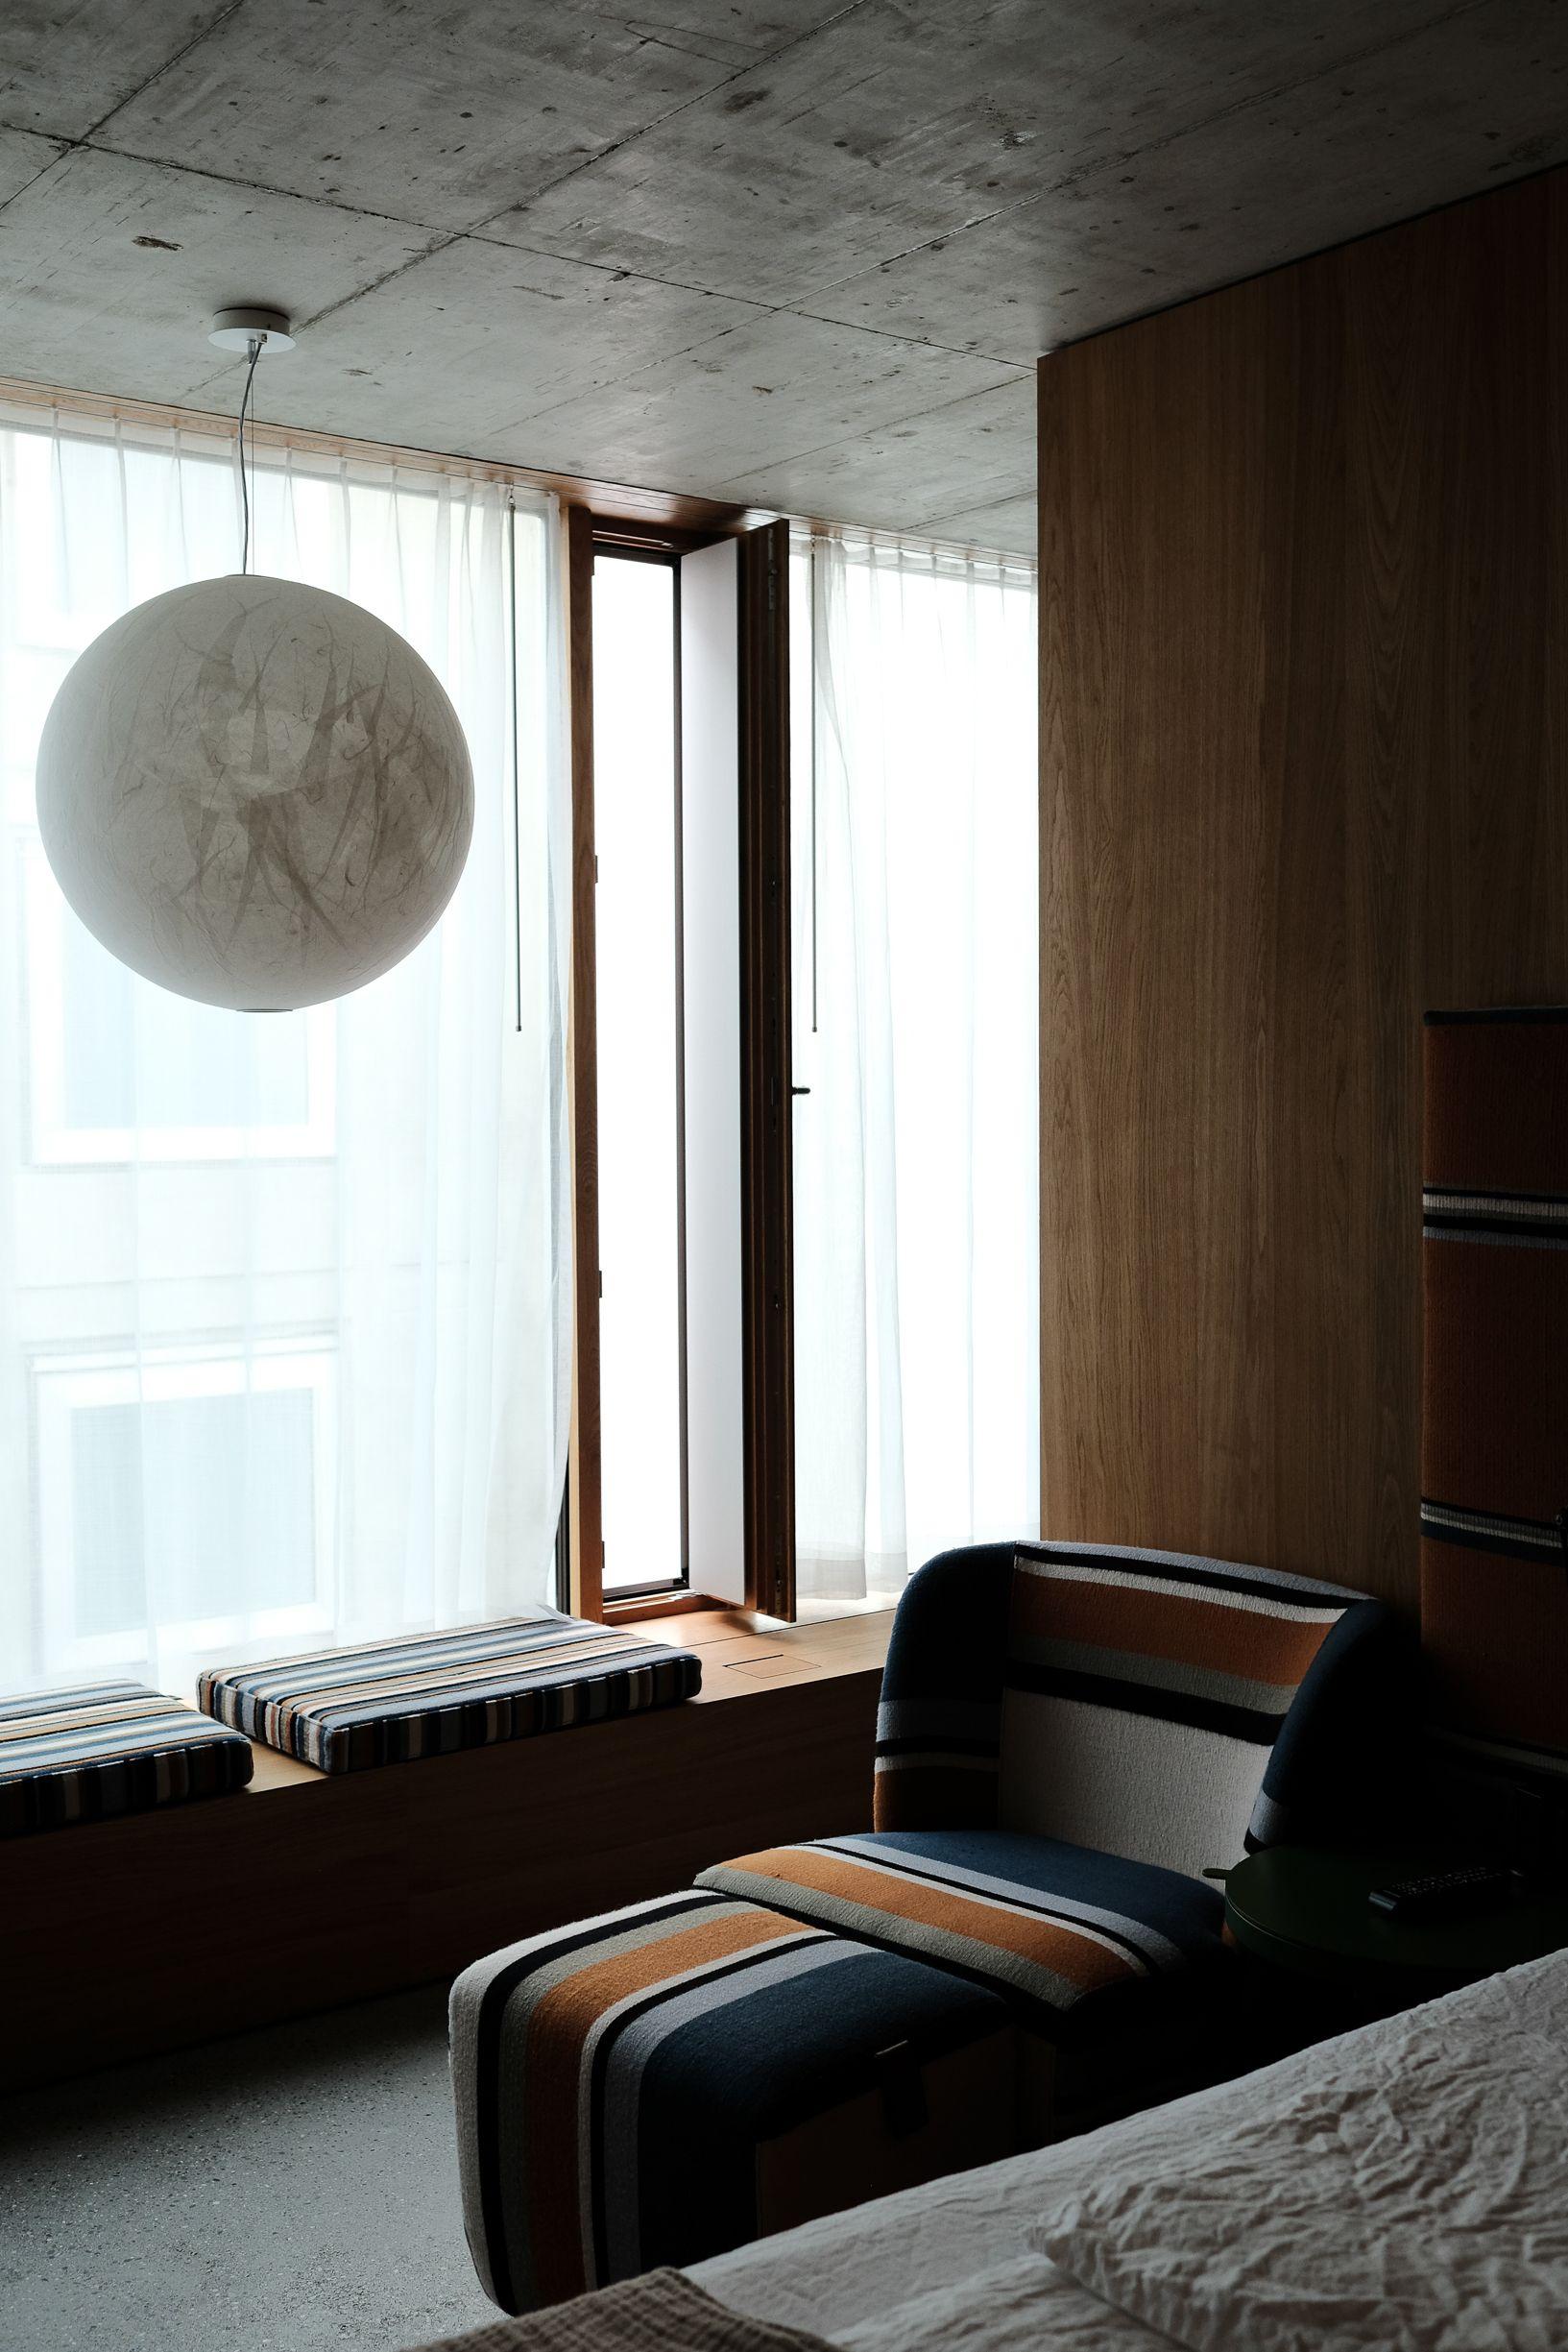 lüftungsflügel, sitzbank, festverglasung, fenster hotel | 334